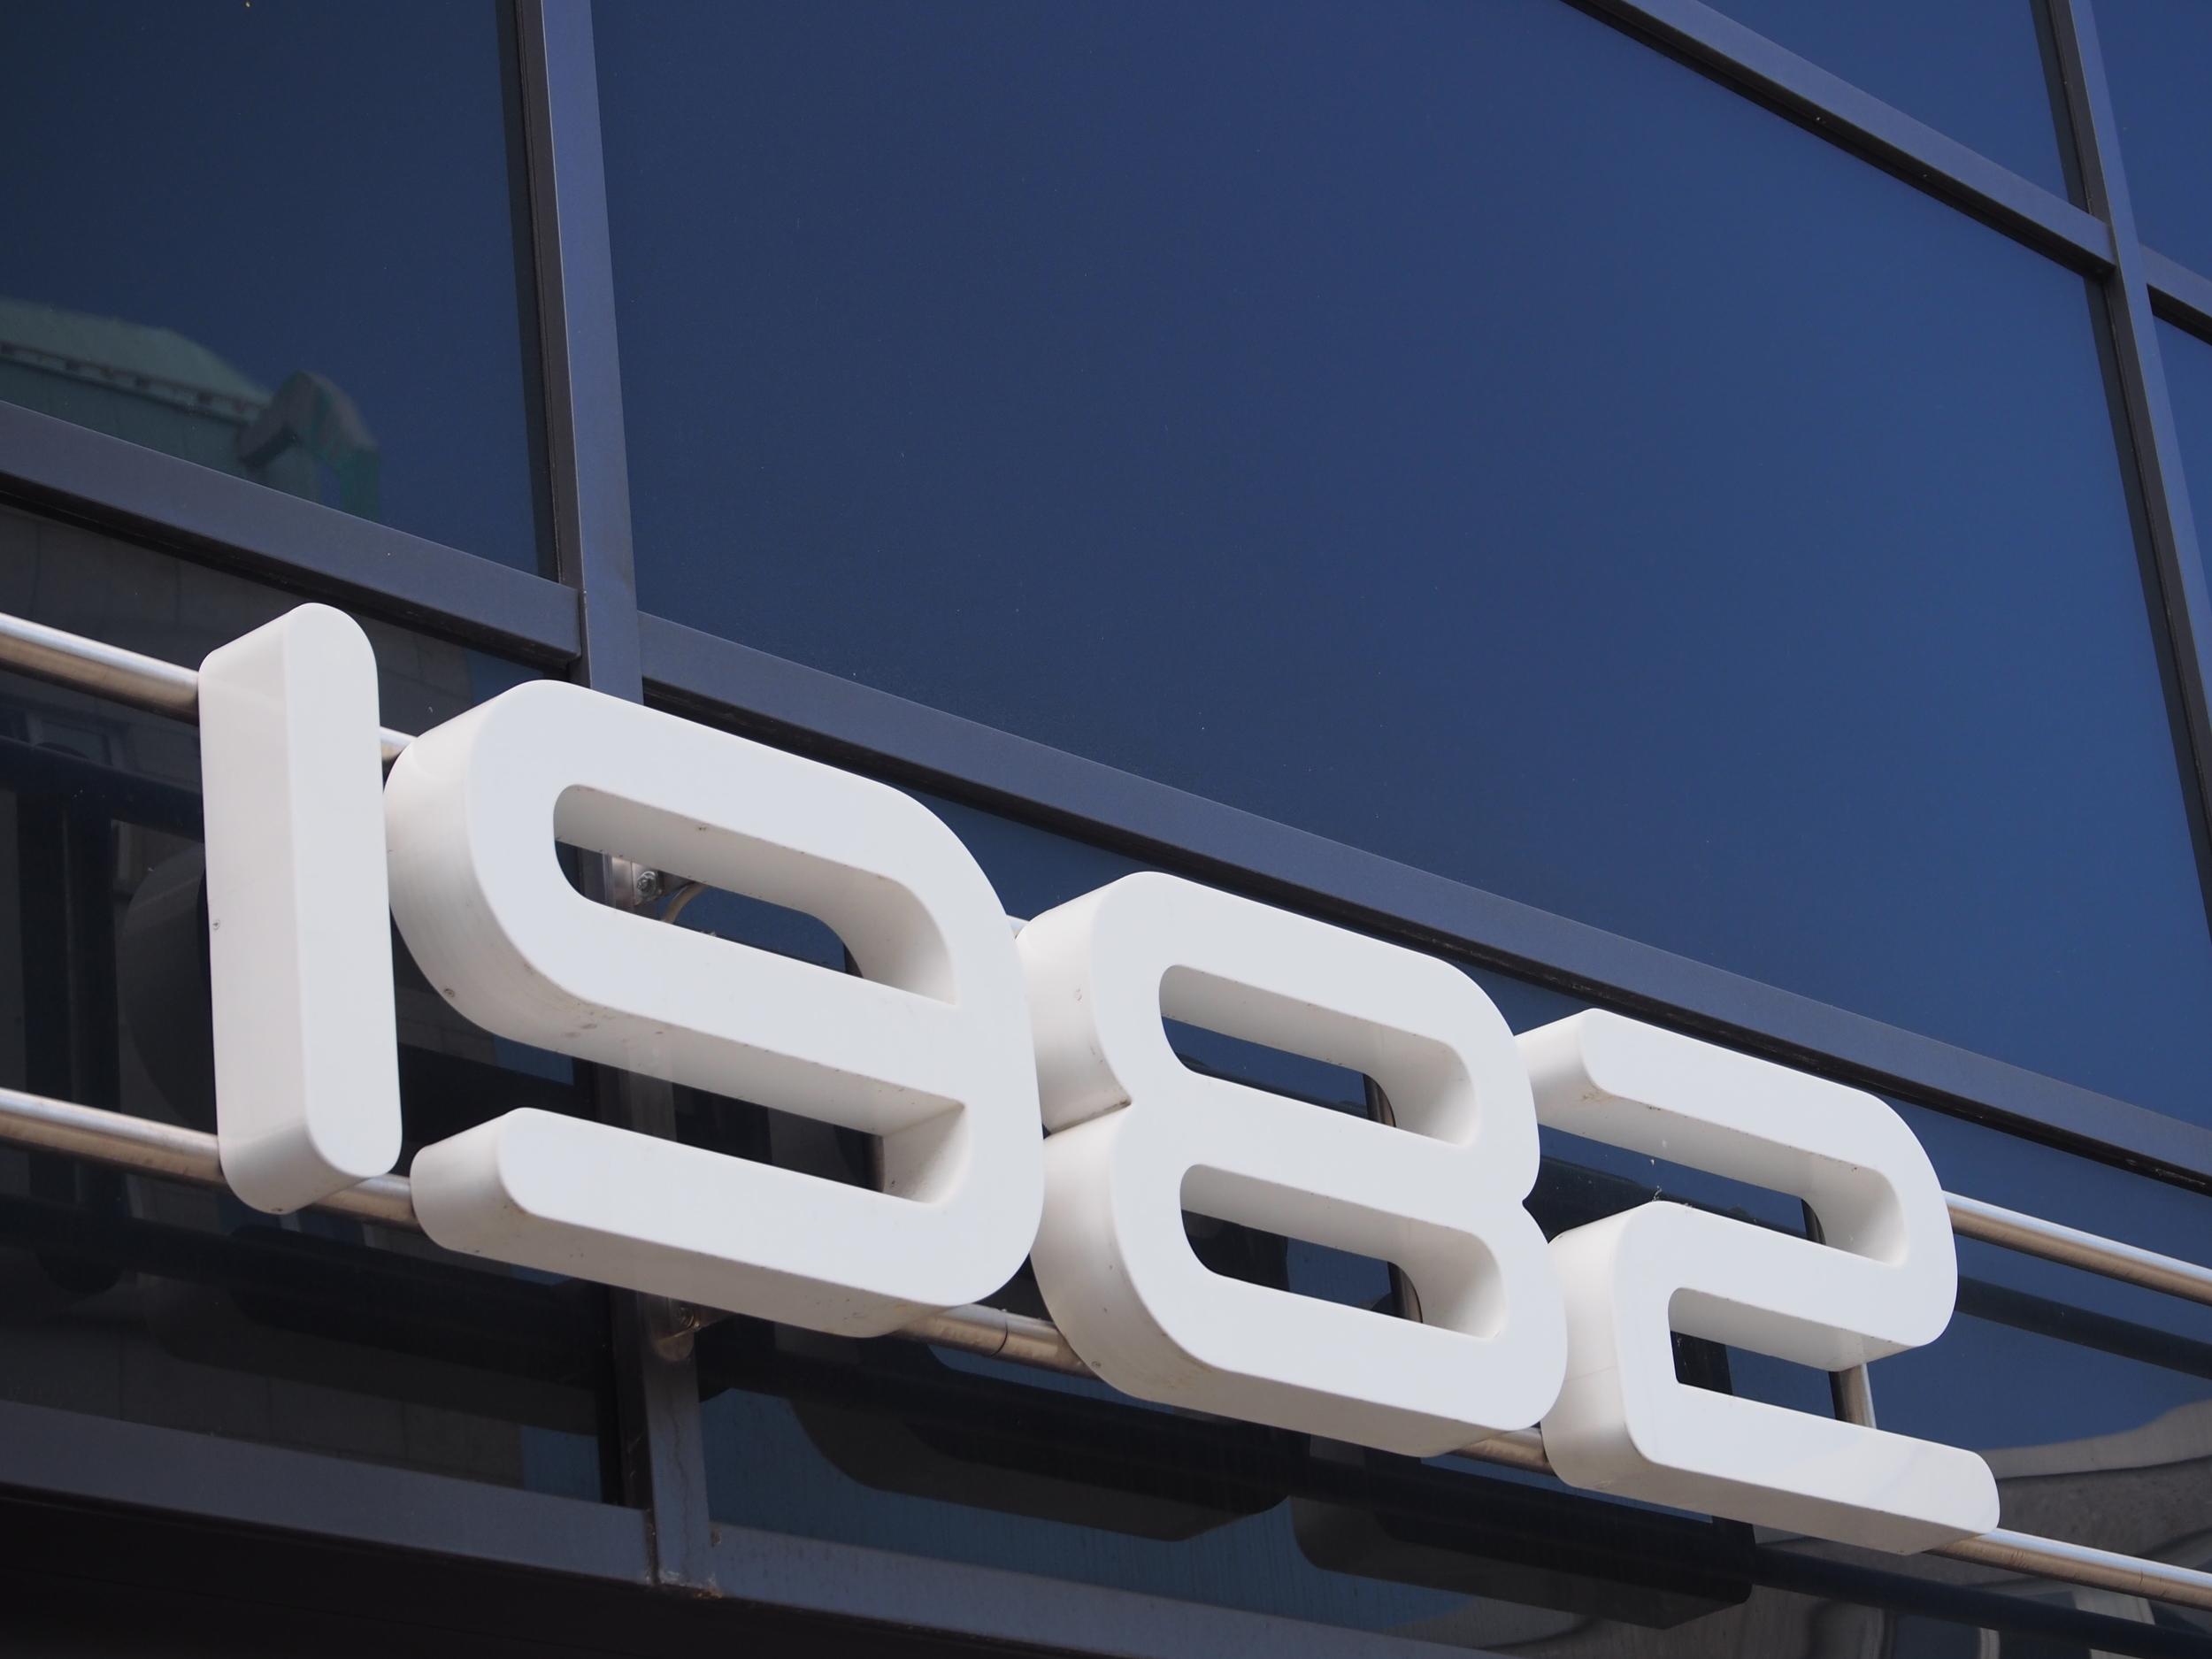 P6010009.JPG